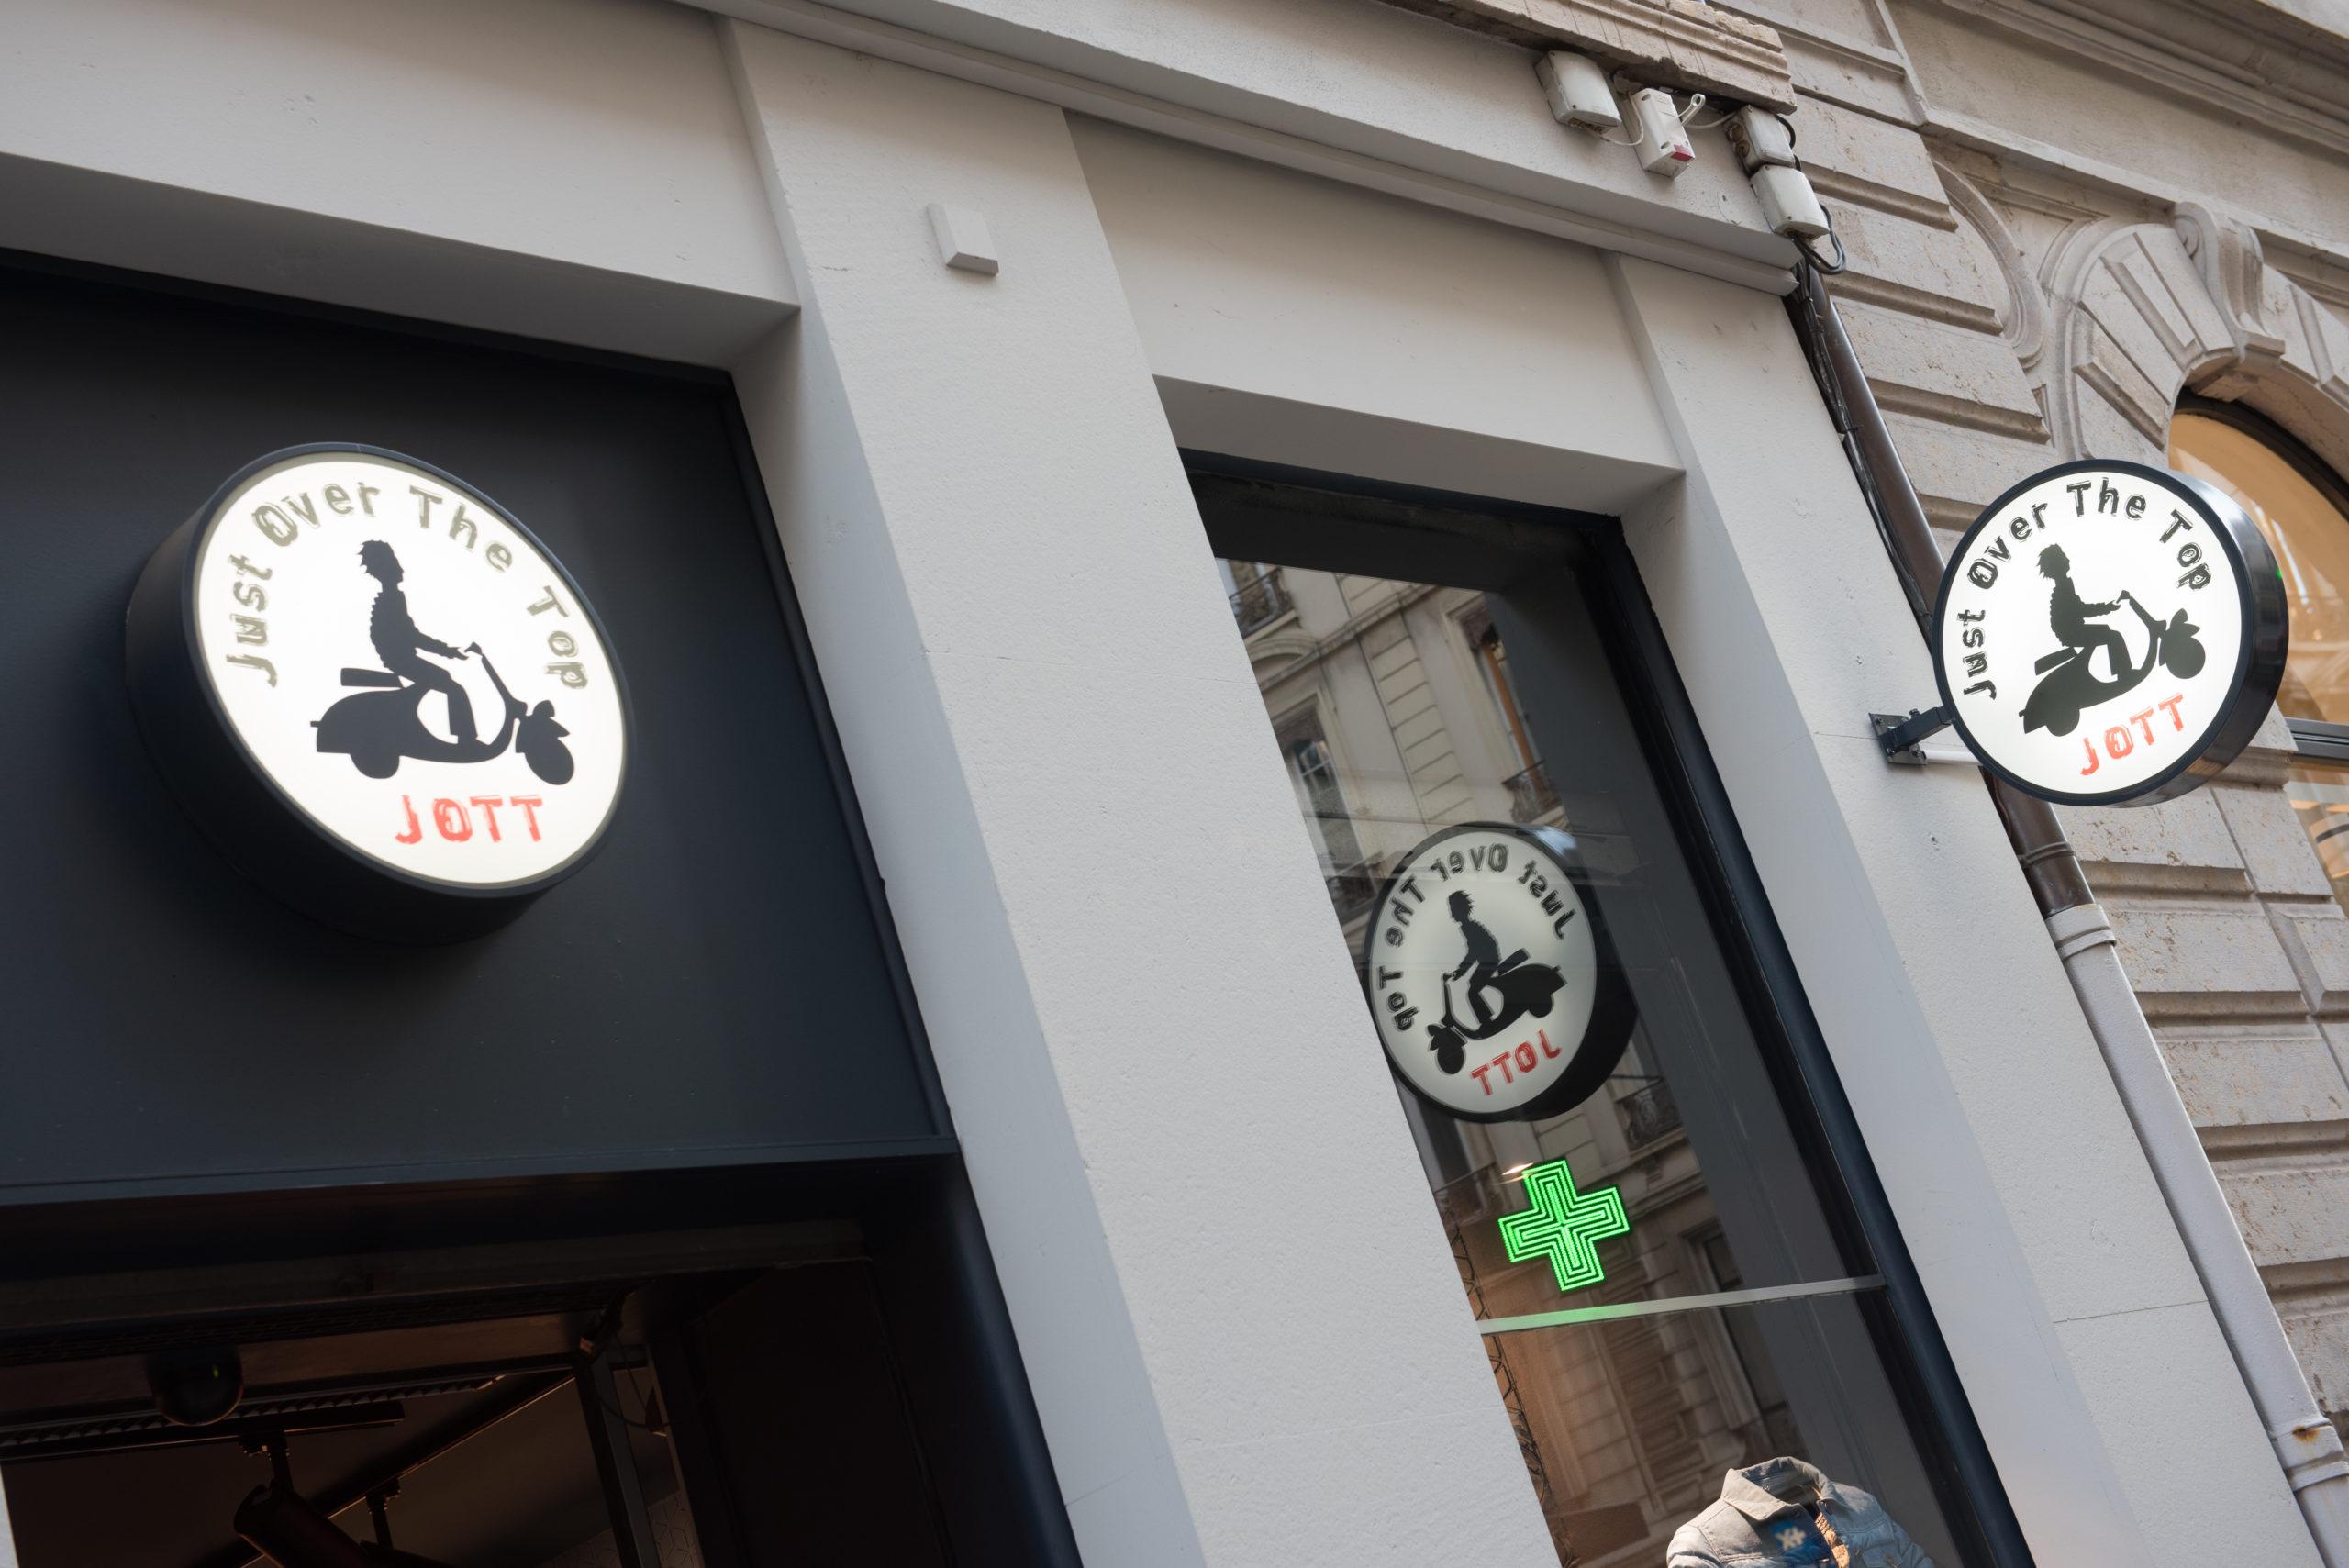 vitrine boutique JOTT Lyon 2